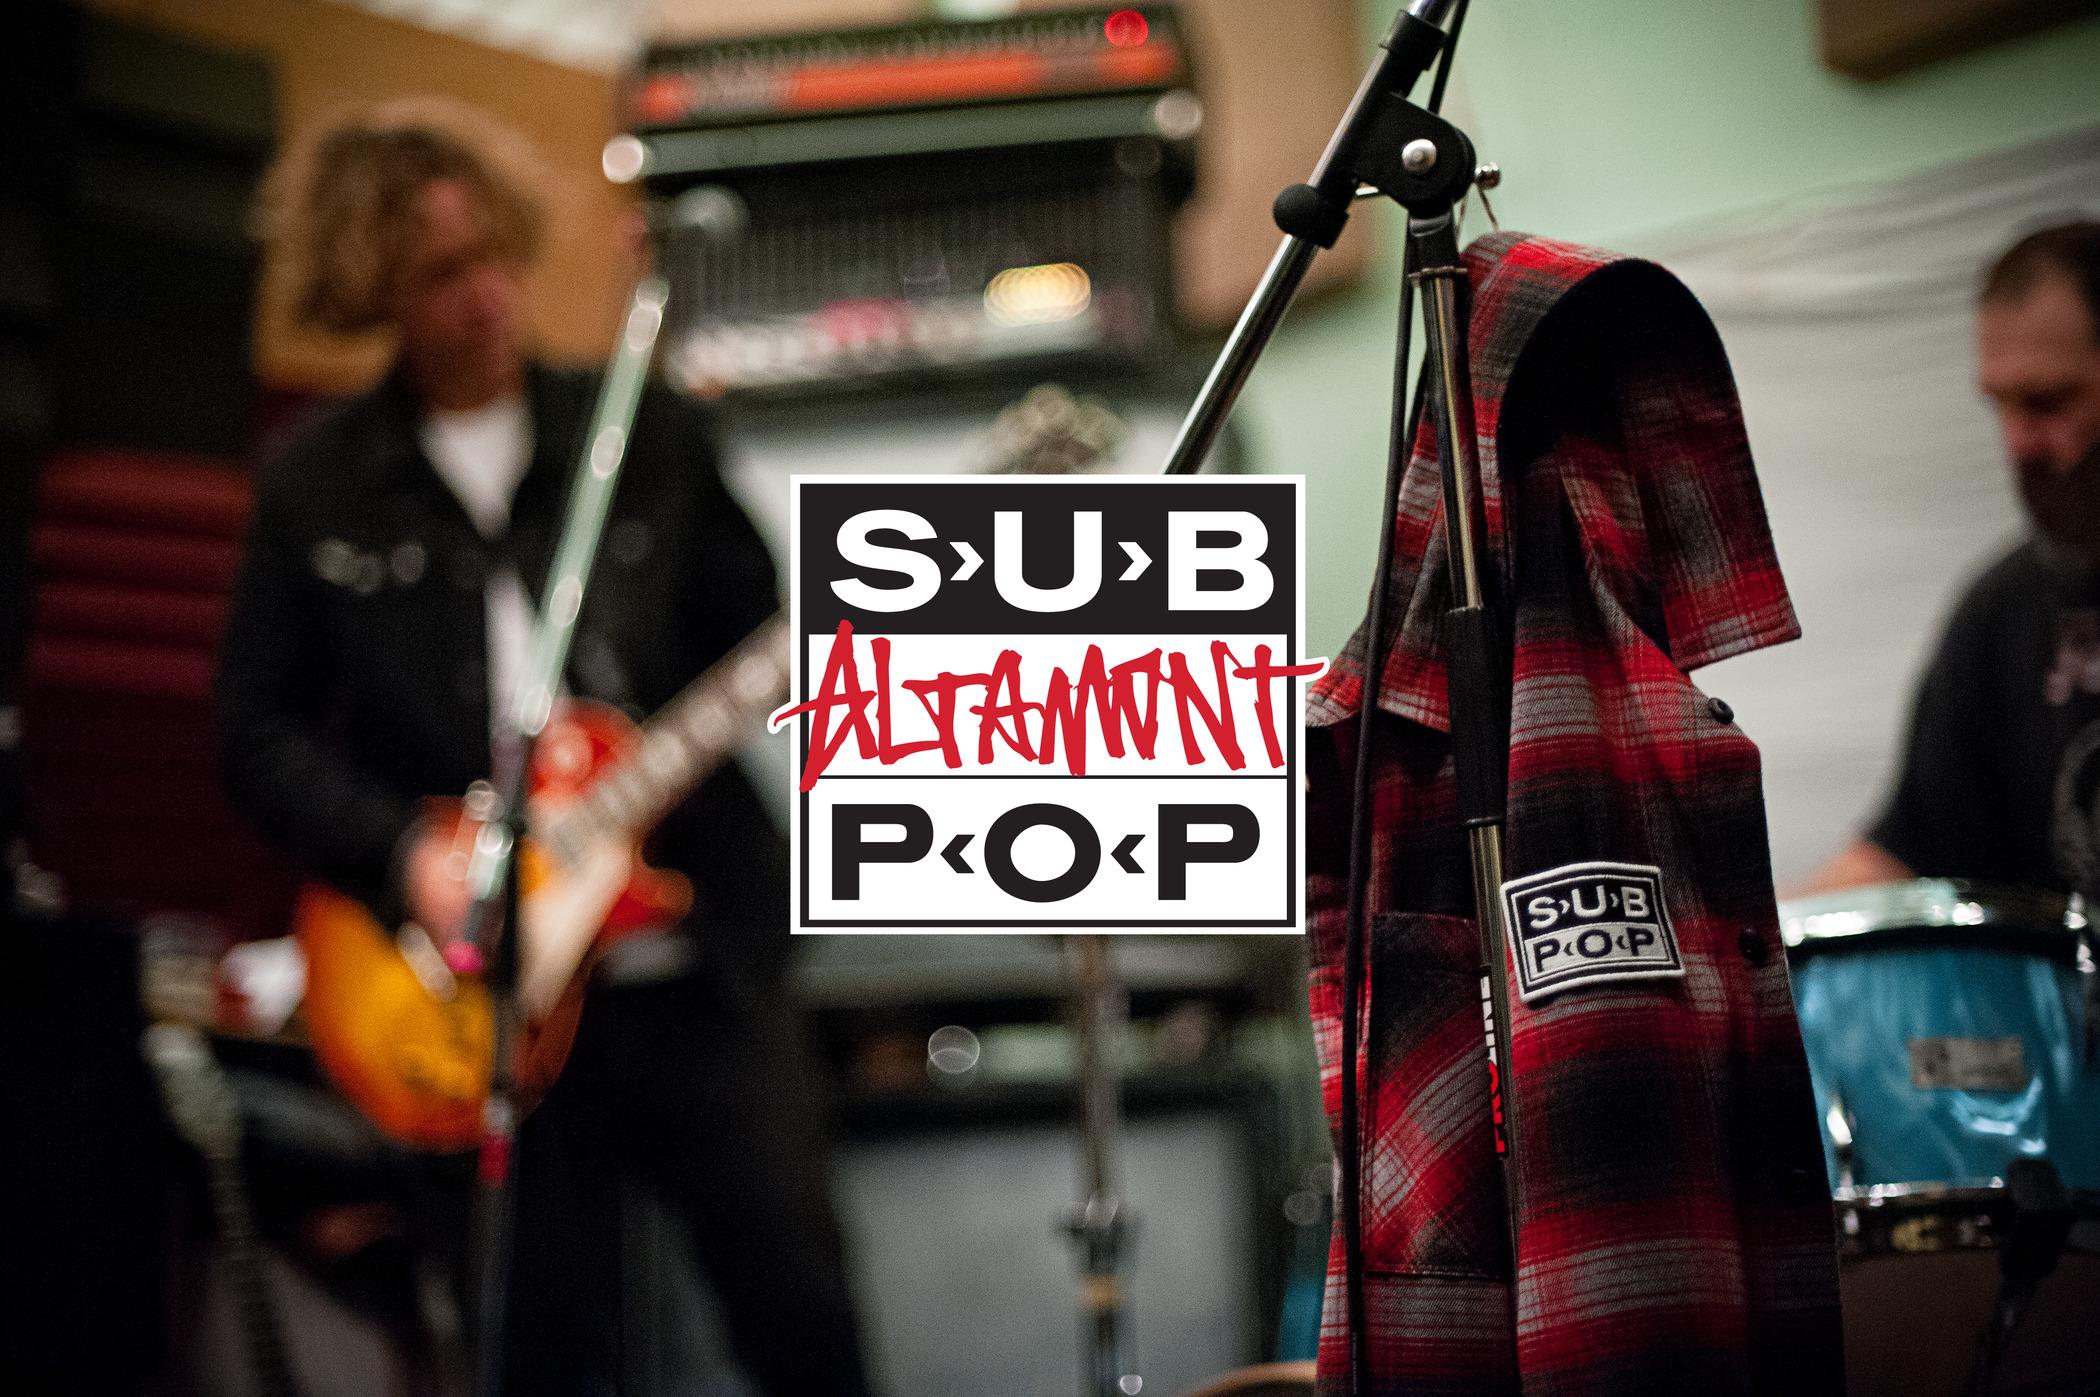 Altamont x SUB POP